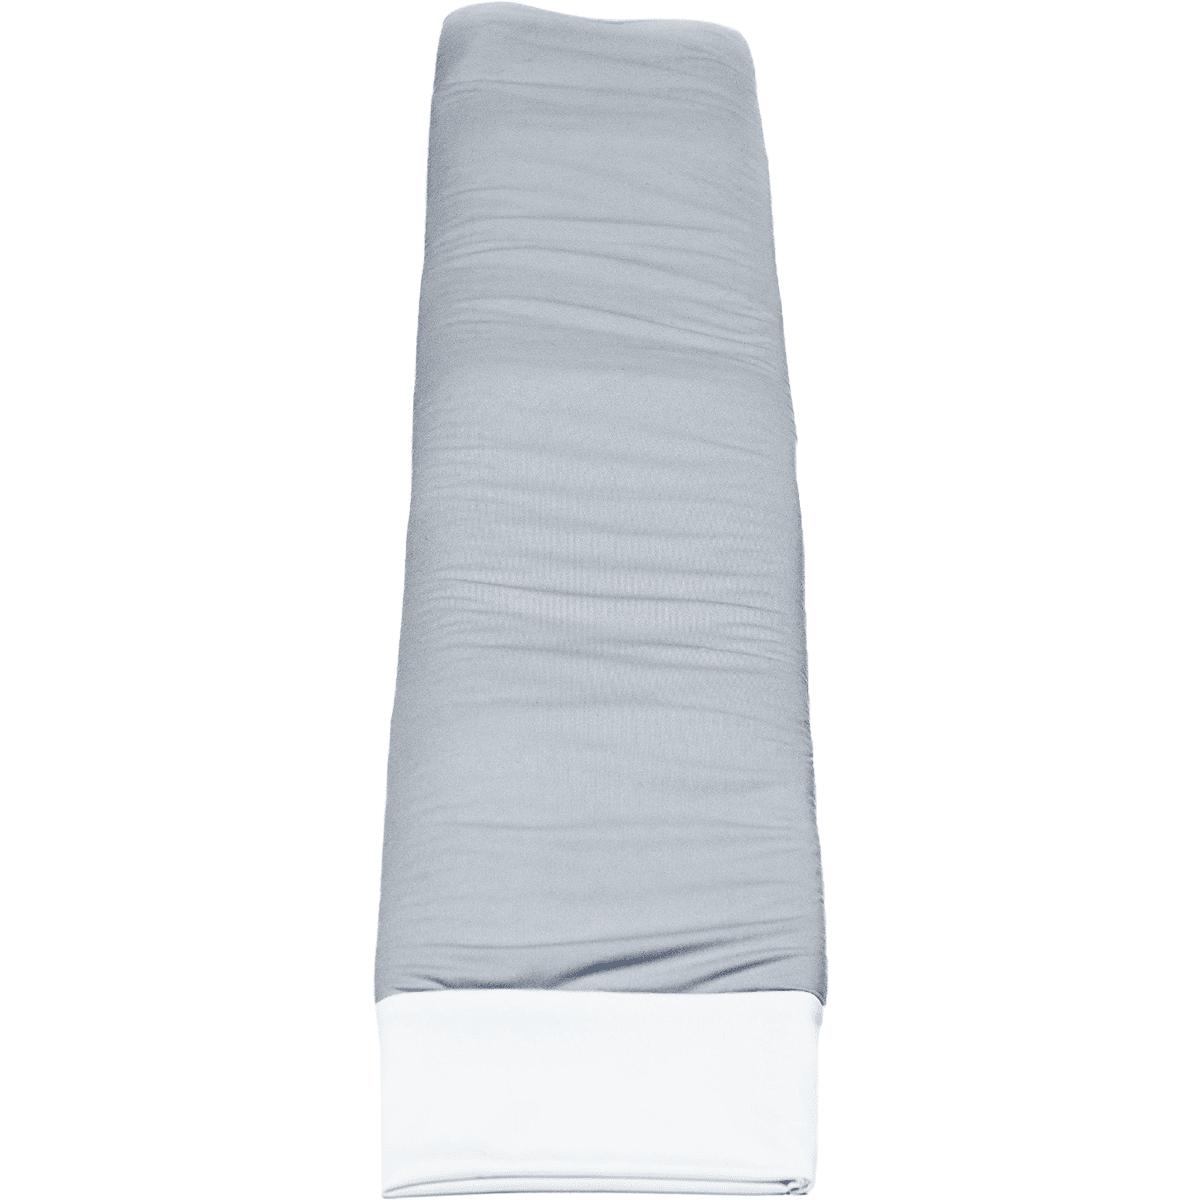 Delonghi Universal Insulated Portable AC Hose Cover DLSA003